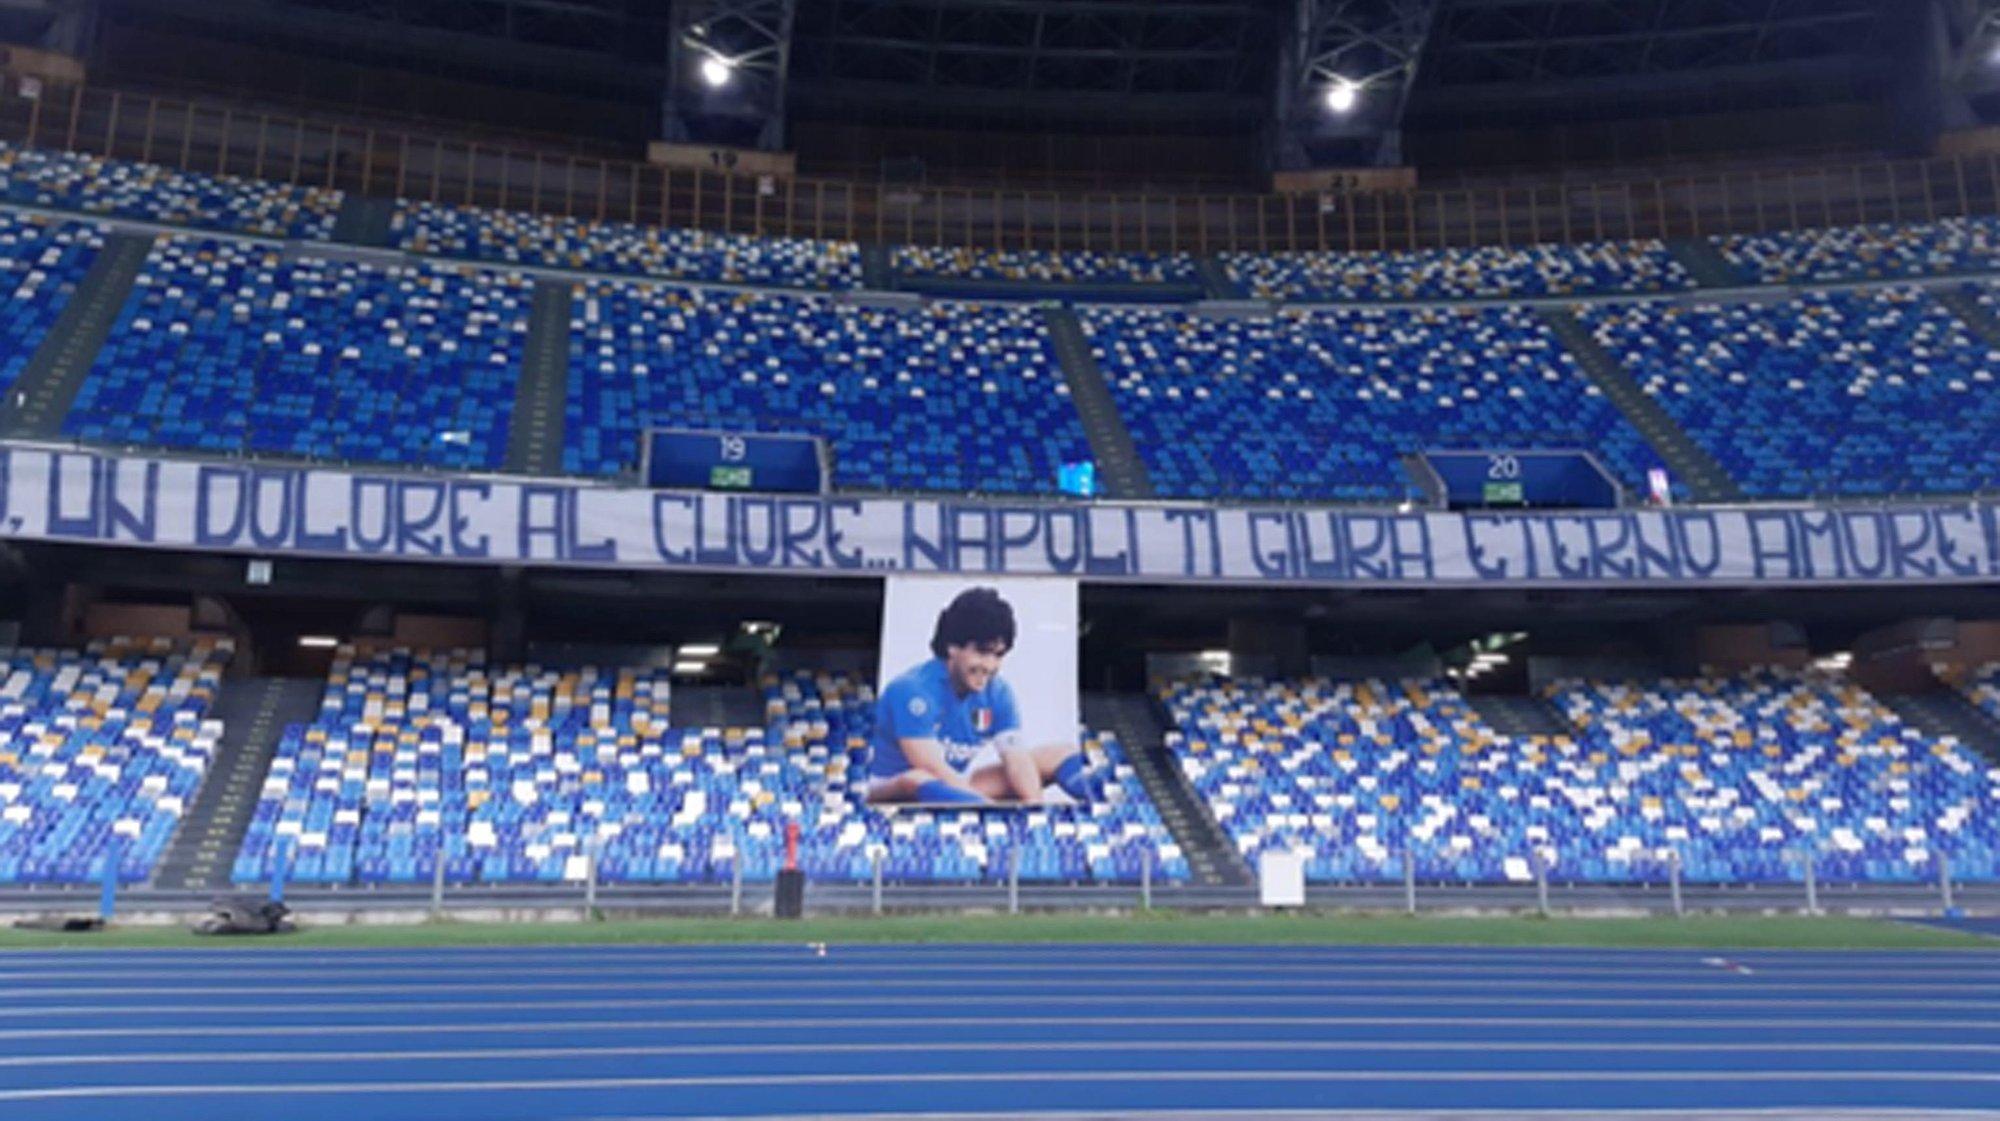 epa08851831 A banner displayed at the San Paolo stadium as a tribute to Diego Armando Maradona prior the Italian Serie A soccer match SSC Napoli vs AS Roma, Naples, Italy,  29 November 2020.  Maradona who played for Napoli died on 25 November 2020 aged 60.  EPA/CIRO FUSCO